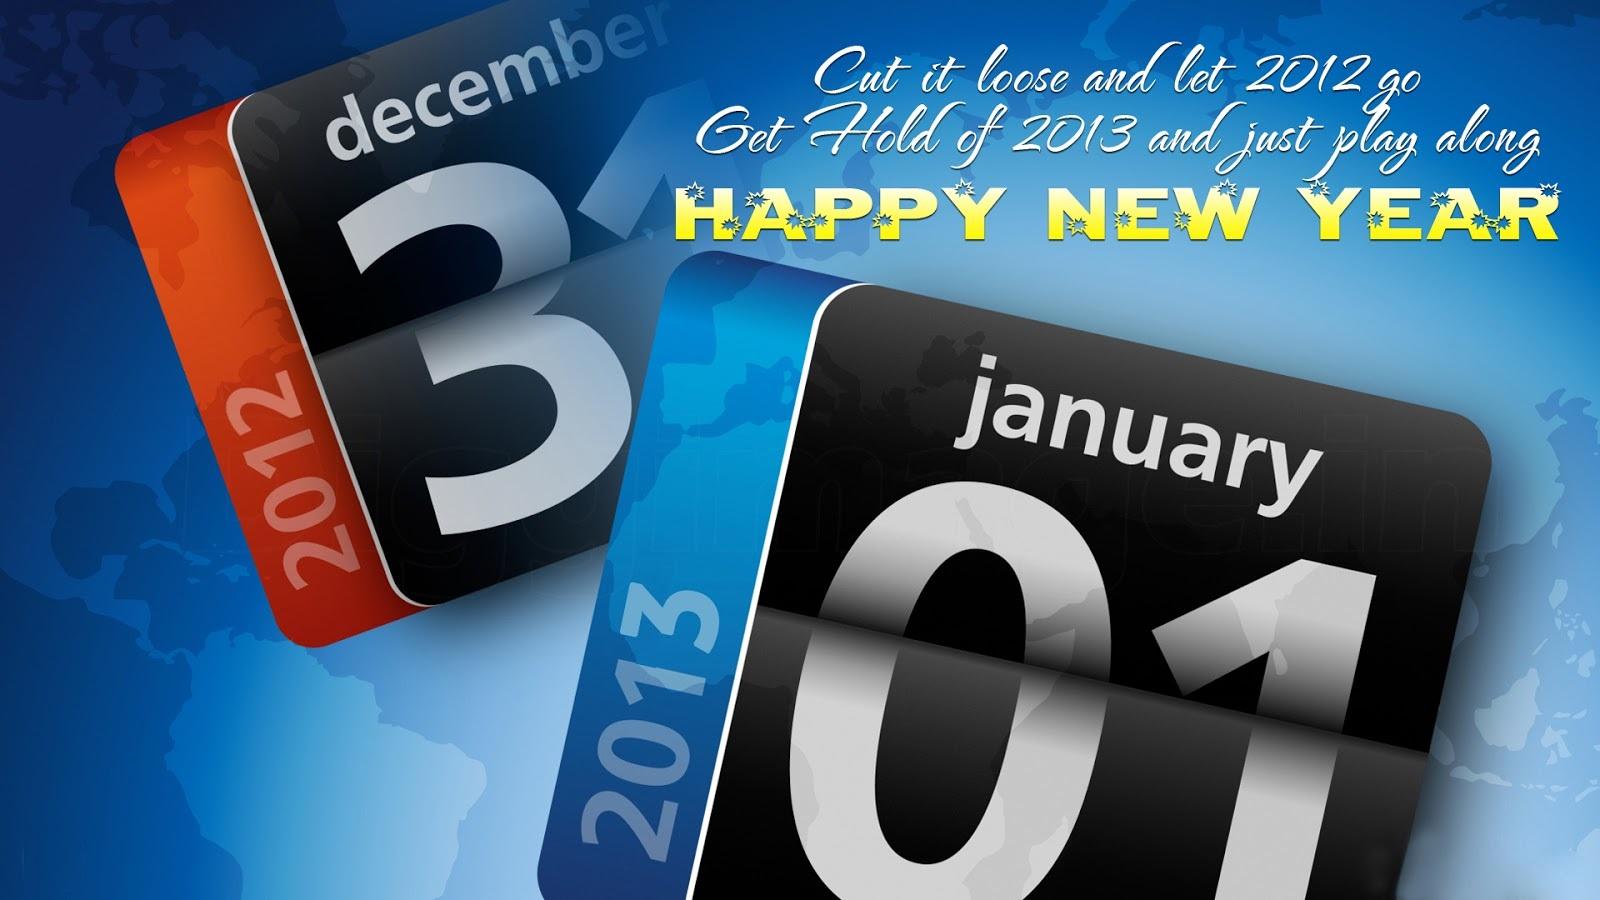 Happy-New-Year-2013-HD-Wallpaper-3